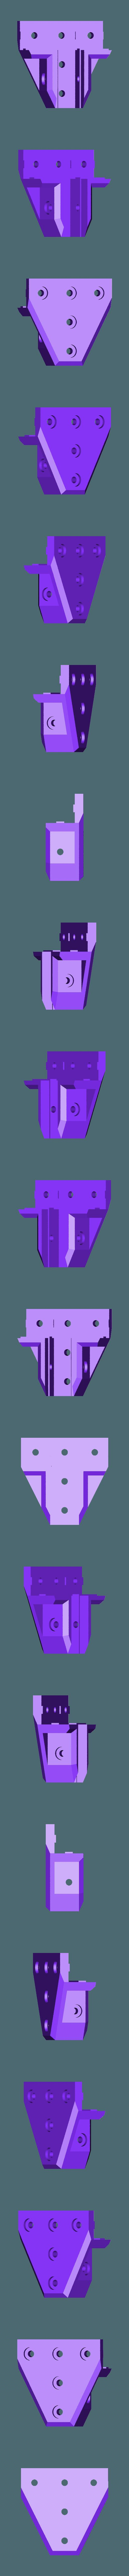 Delta-2-Way-4-Screw-PD-Plate-Reinforced-C.stl Download free STL file 2020 Profile Aluminum 3D Printable Erector Set • 3D printer model, adamjvr